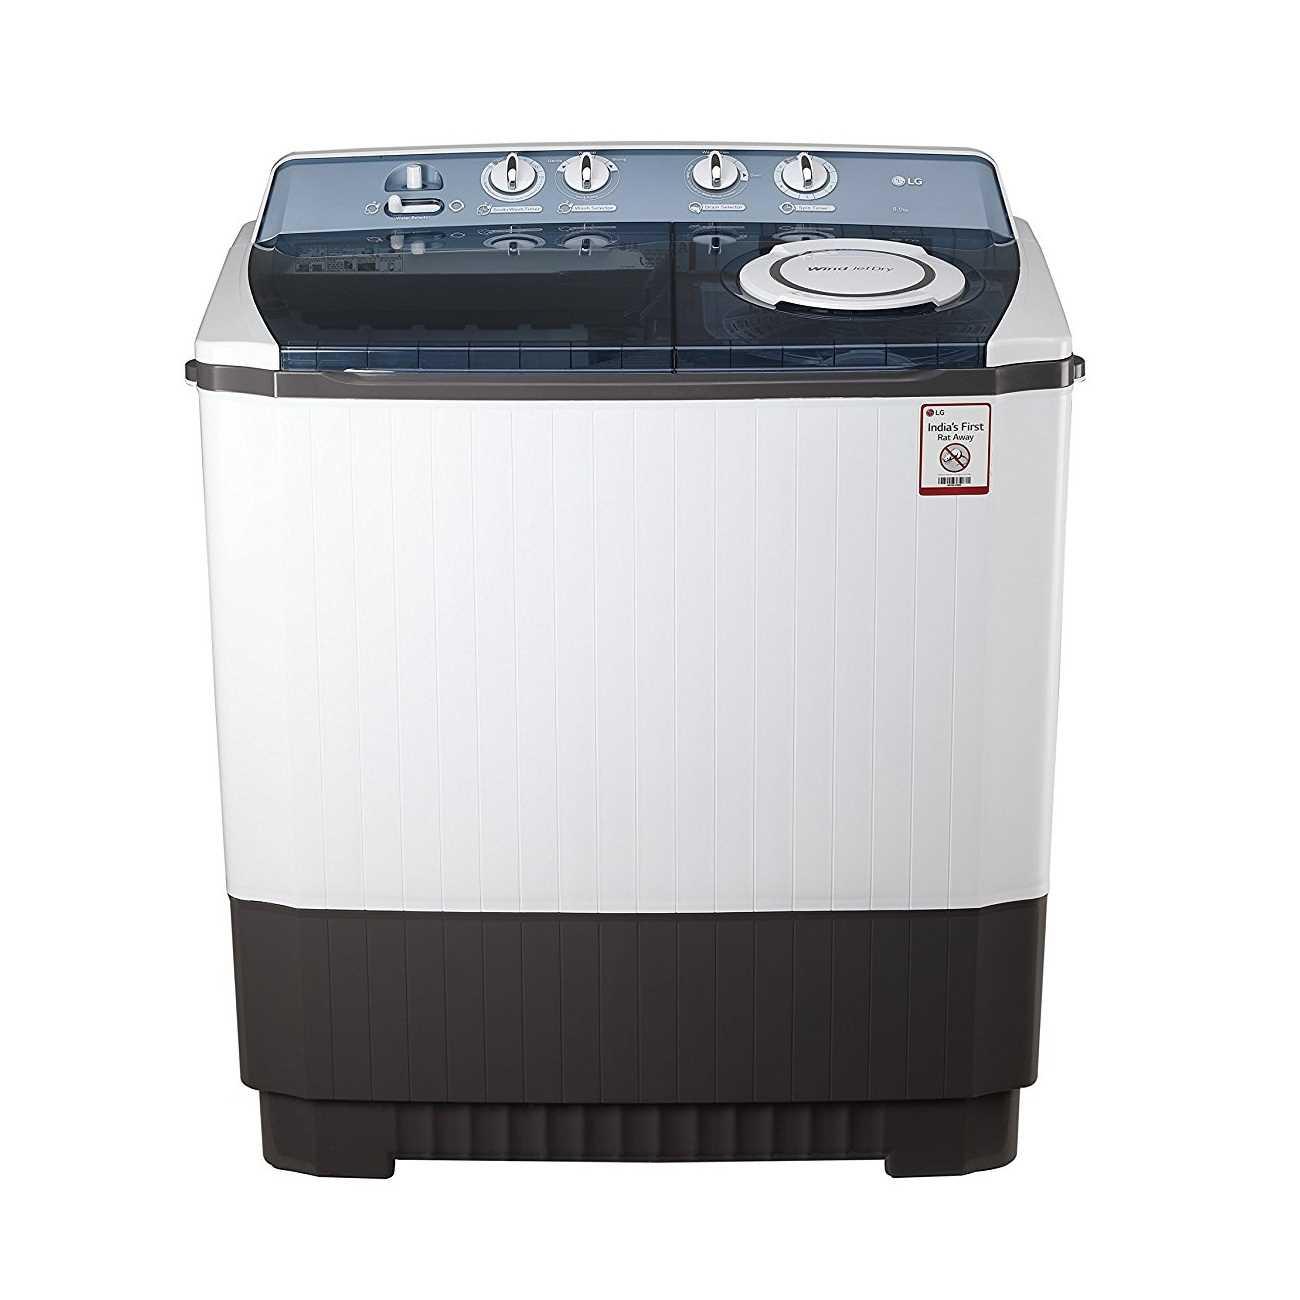 LG P1064R3SA 9 Kg Semi Automatic Top Loading Washing Machine